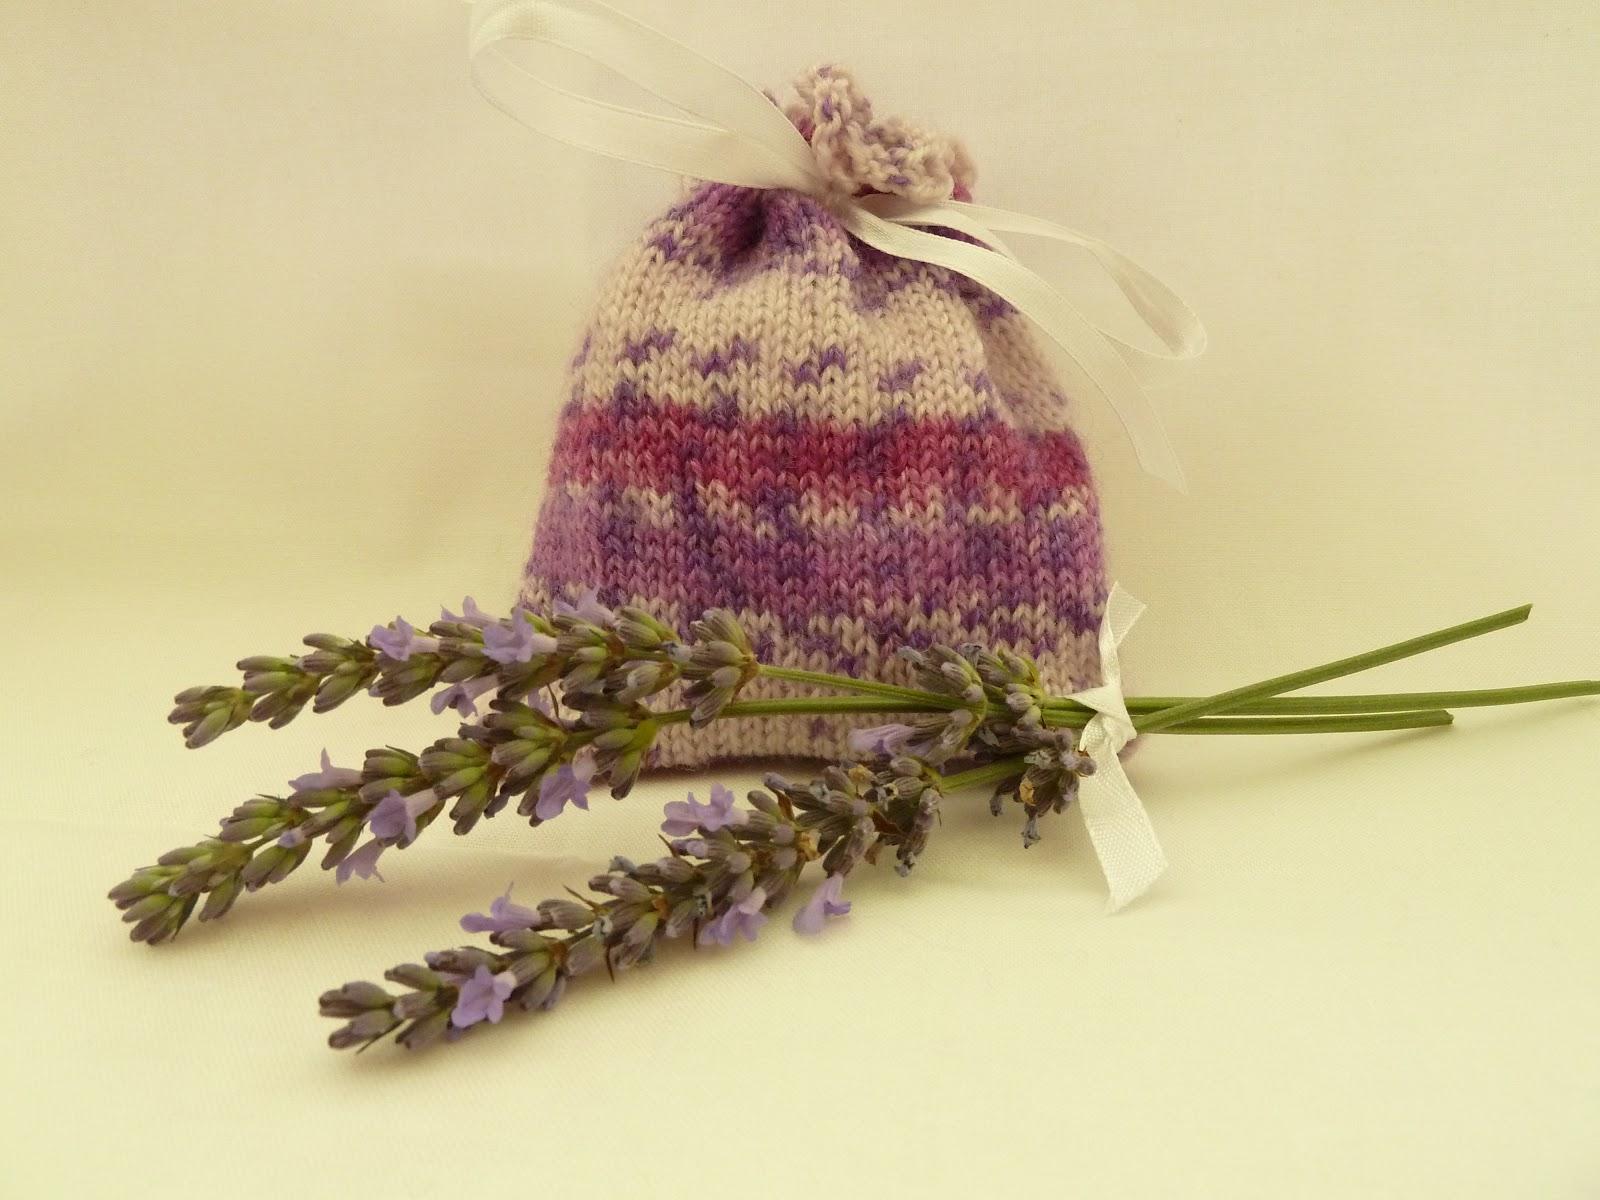 Knitting Pattern Lavender Bag : Judi Knits and Sews: Knitted Lavender Bag